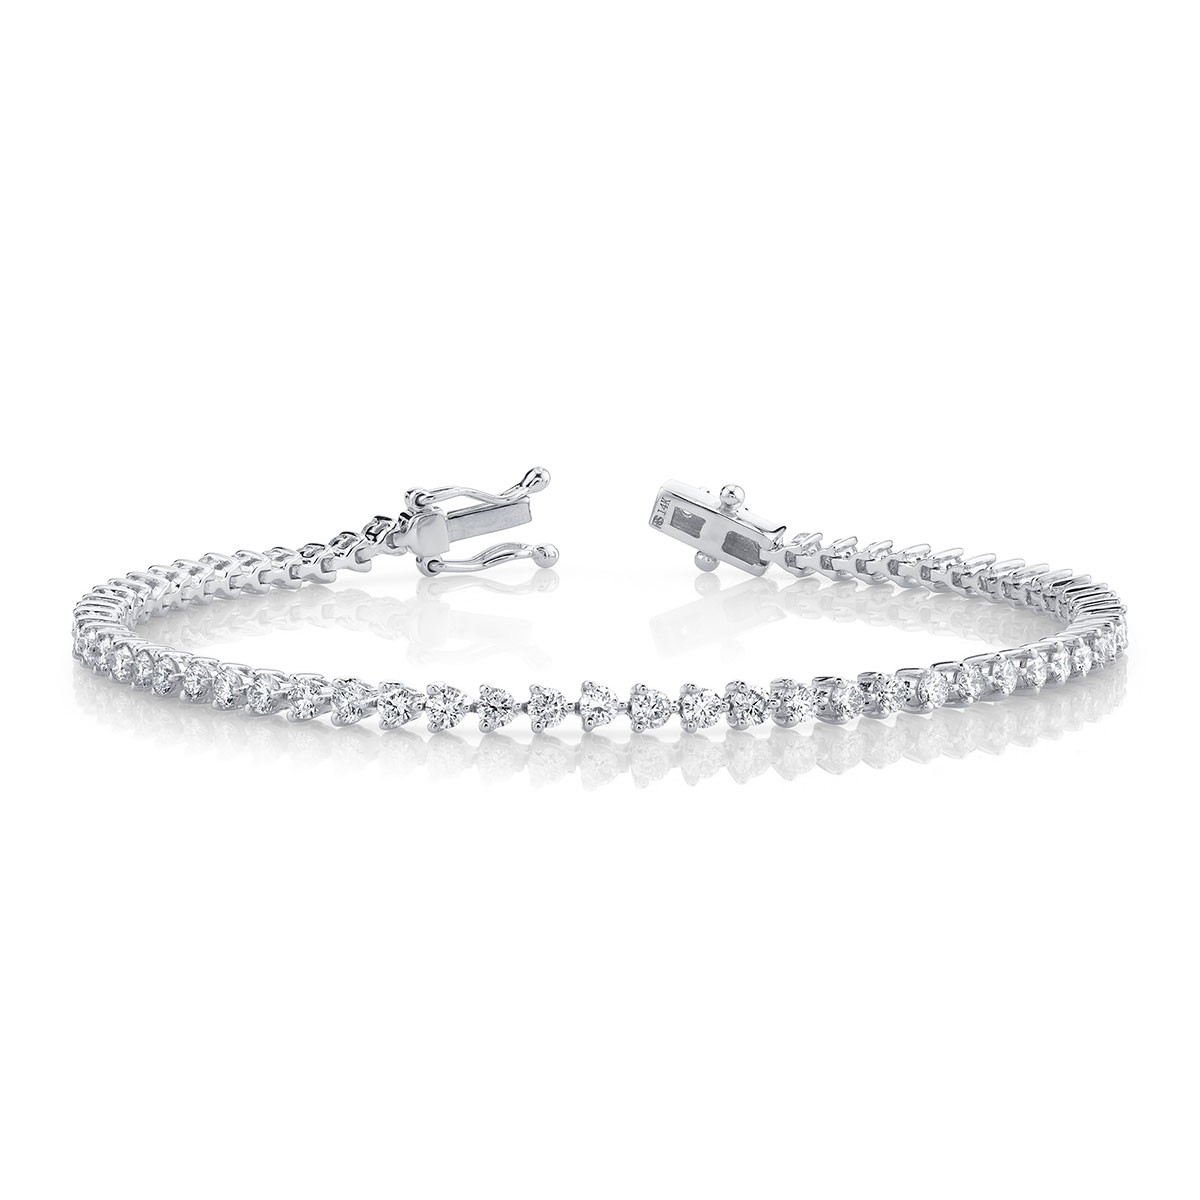 14k White Gold 3 Prong 2.5CT Diamond Tennis Bracelet